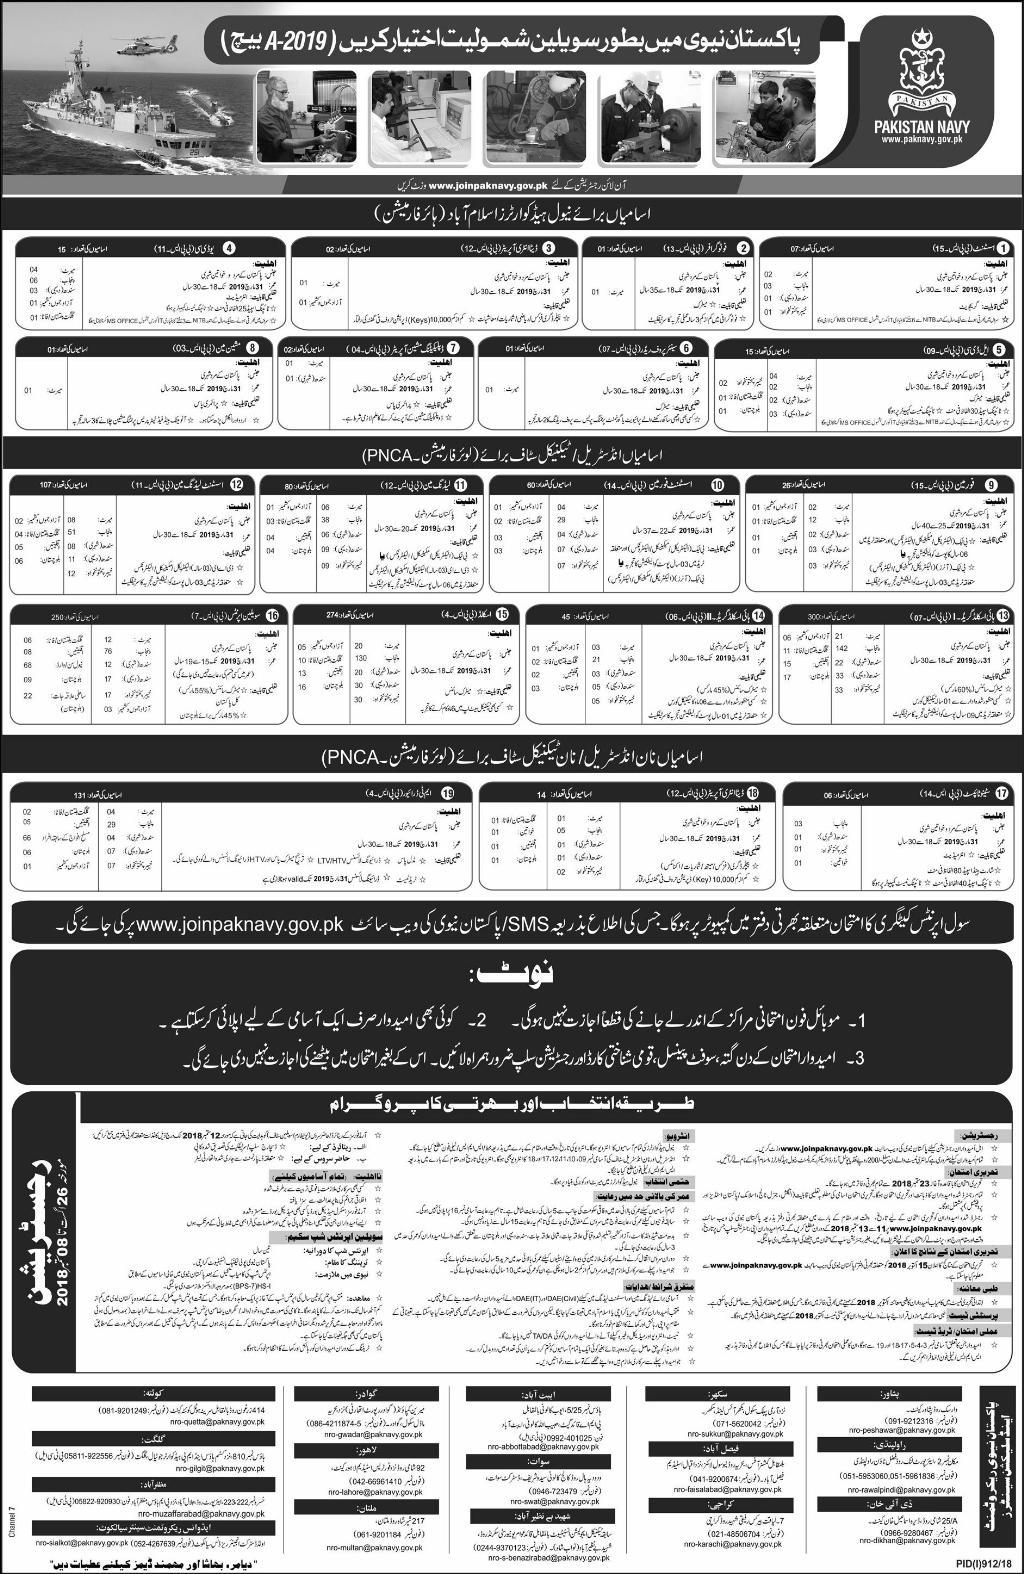 Join Pakistan Navy Civilian Jobs Batch 2019 A